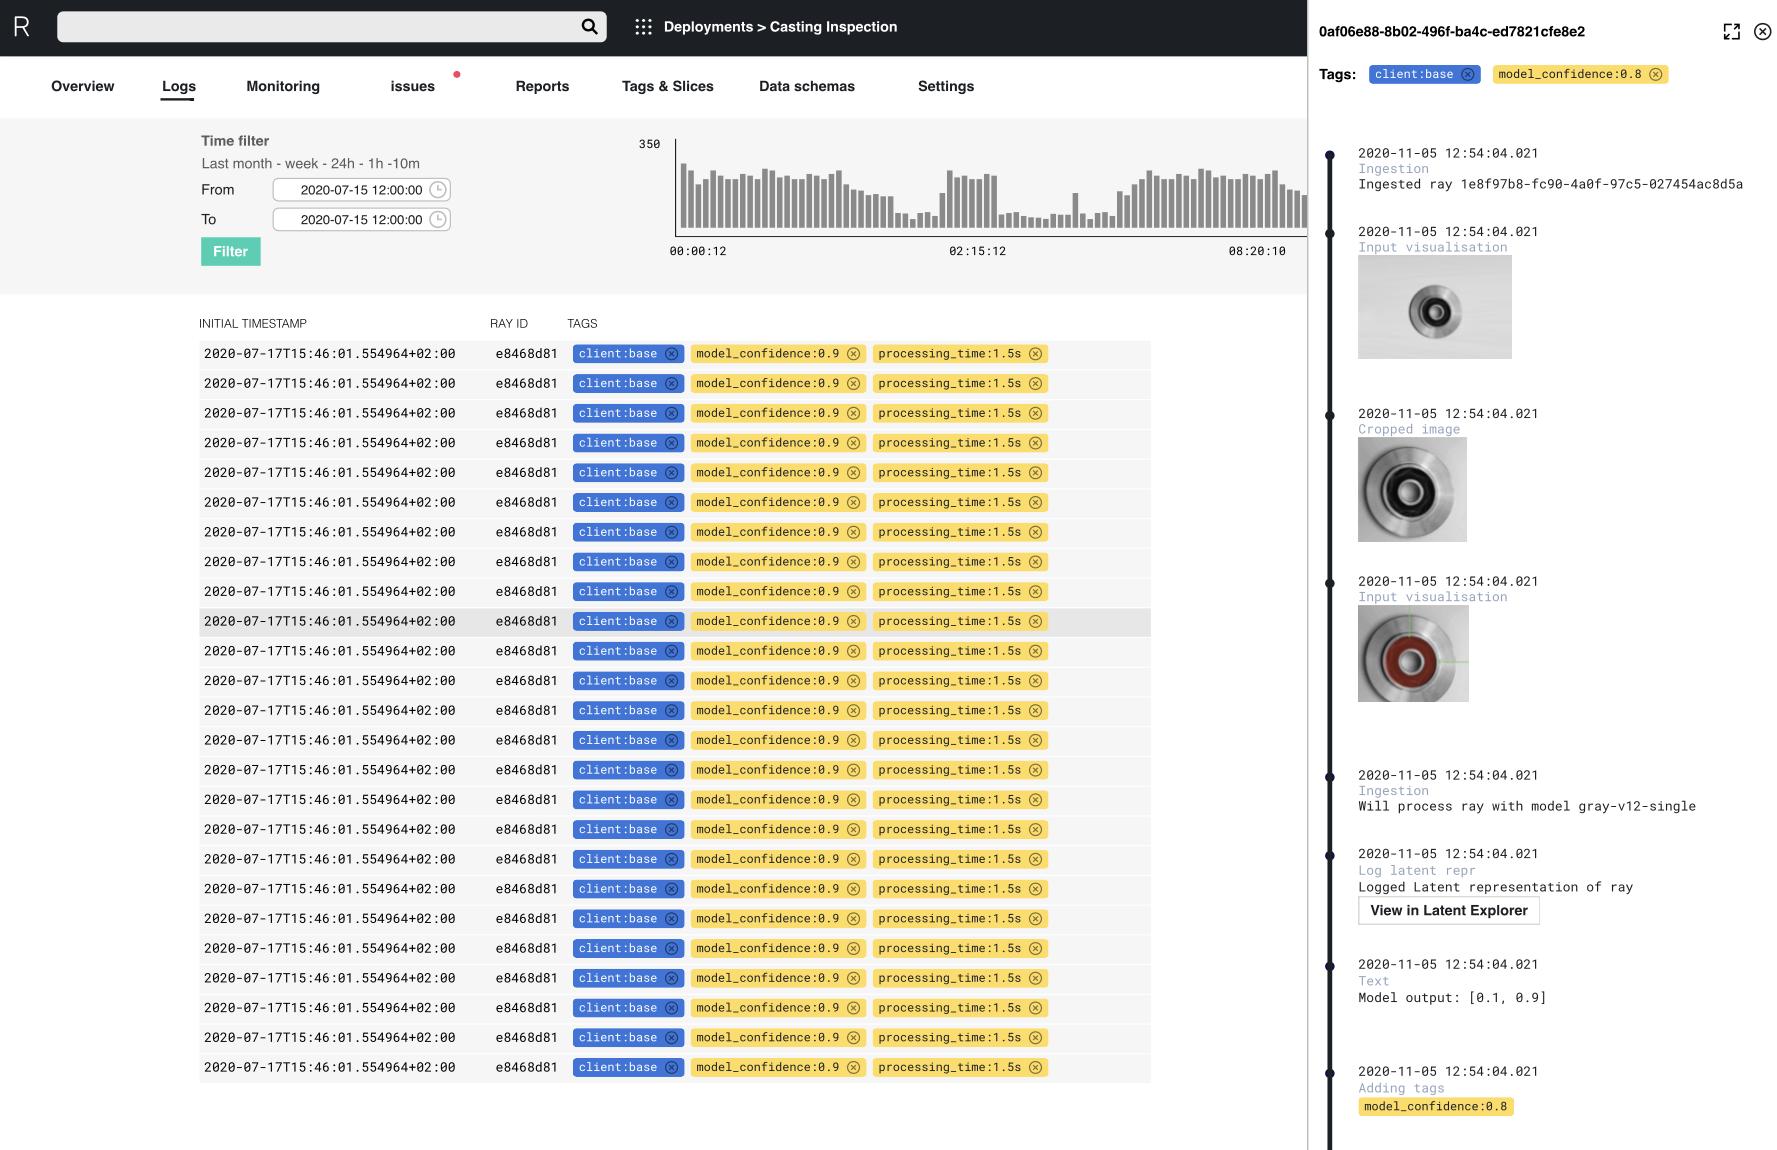 Data tracing, inspection & debugging